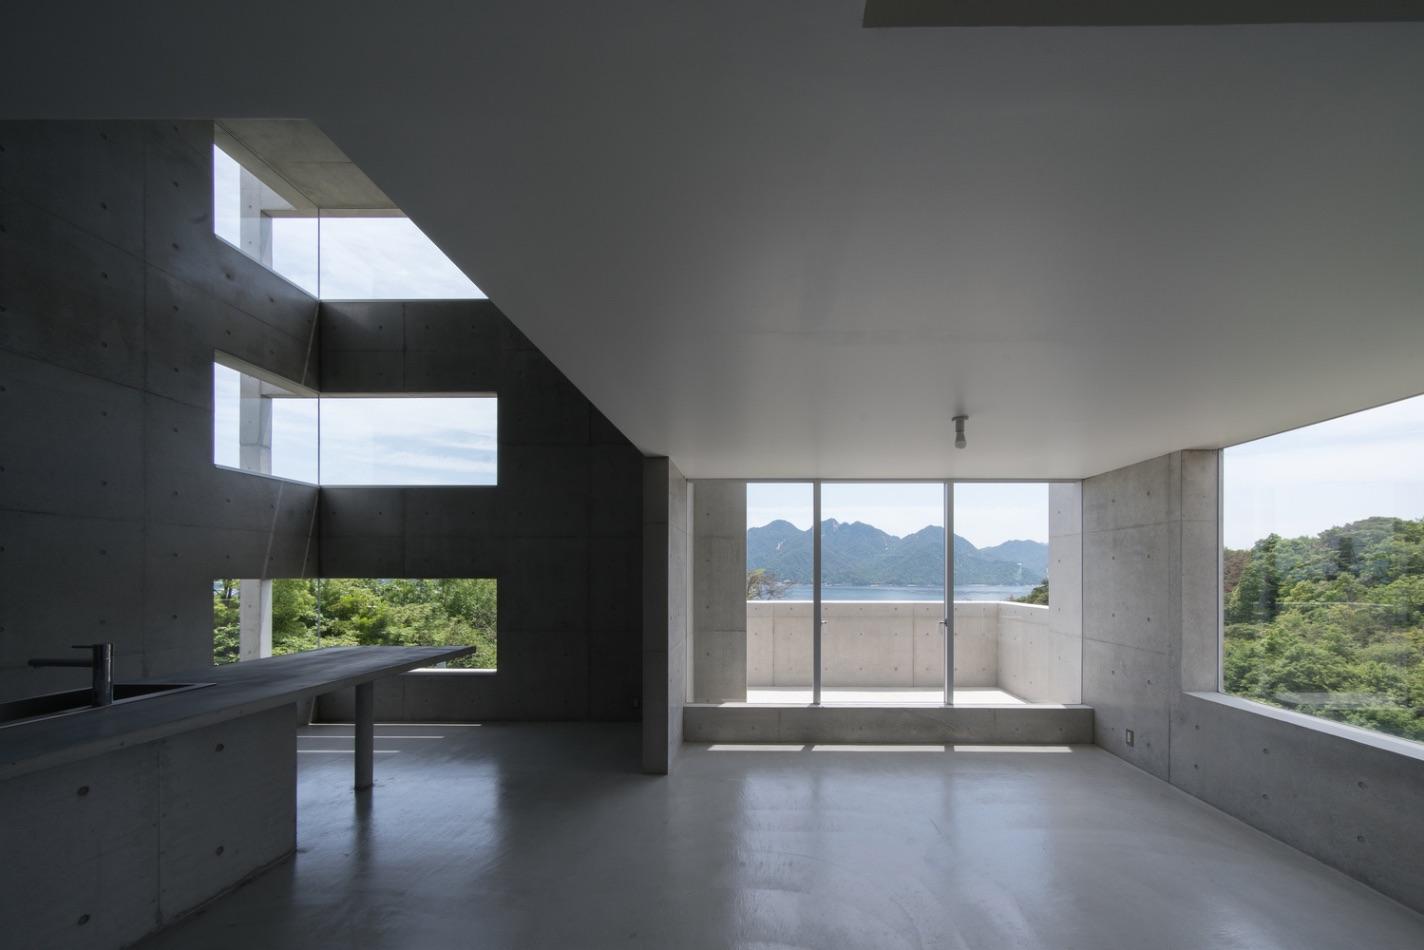 2_House in Ajina_Kazunori Fujimoto Architect & Associates_Inspirationist